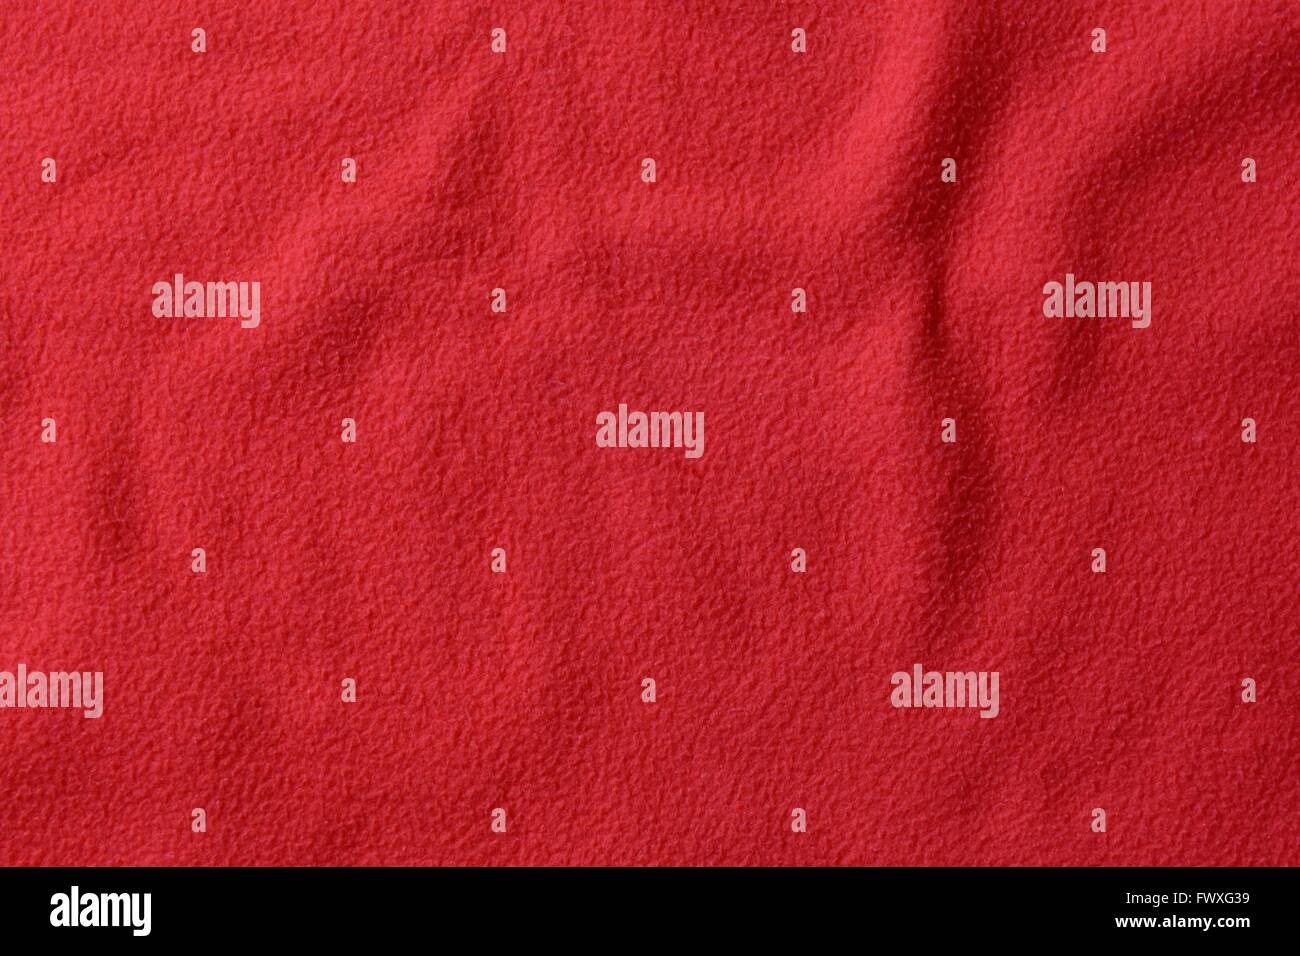 Red velvet texture Background Of Red Velvet Fabric With Arbitrary